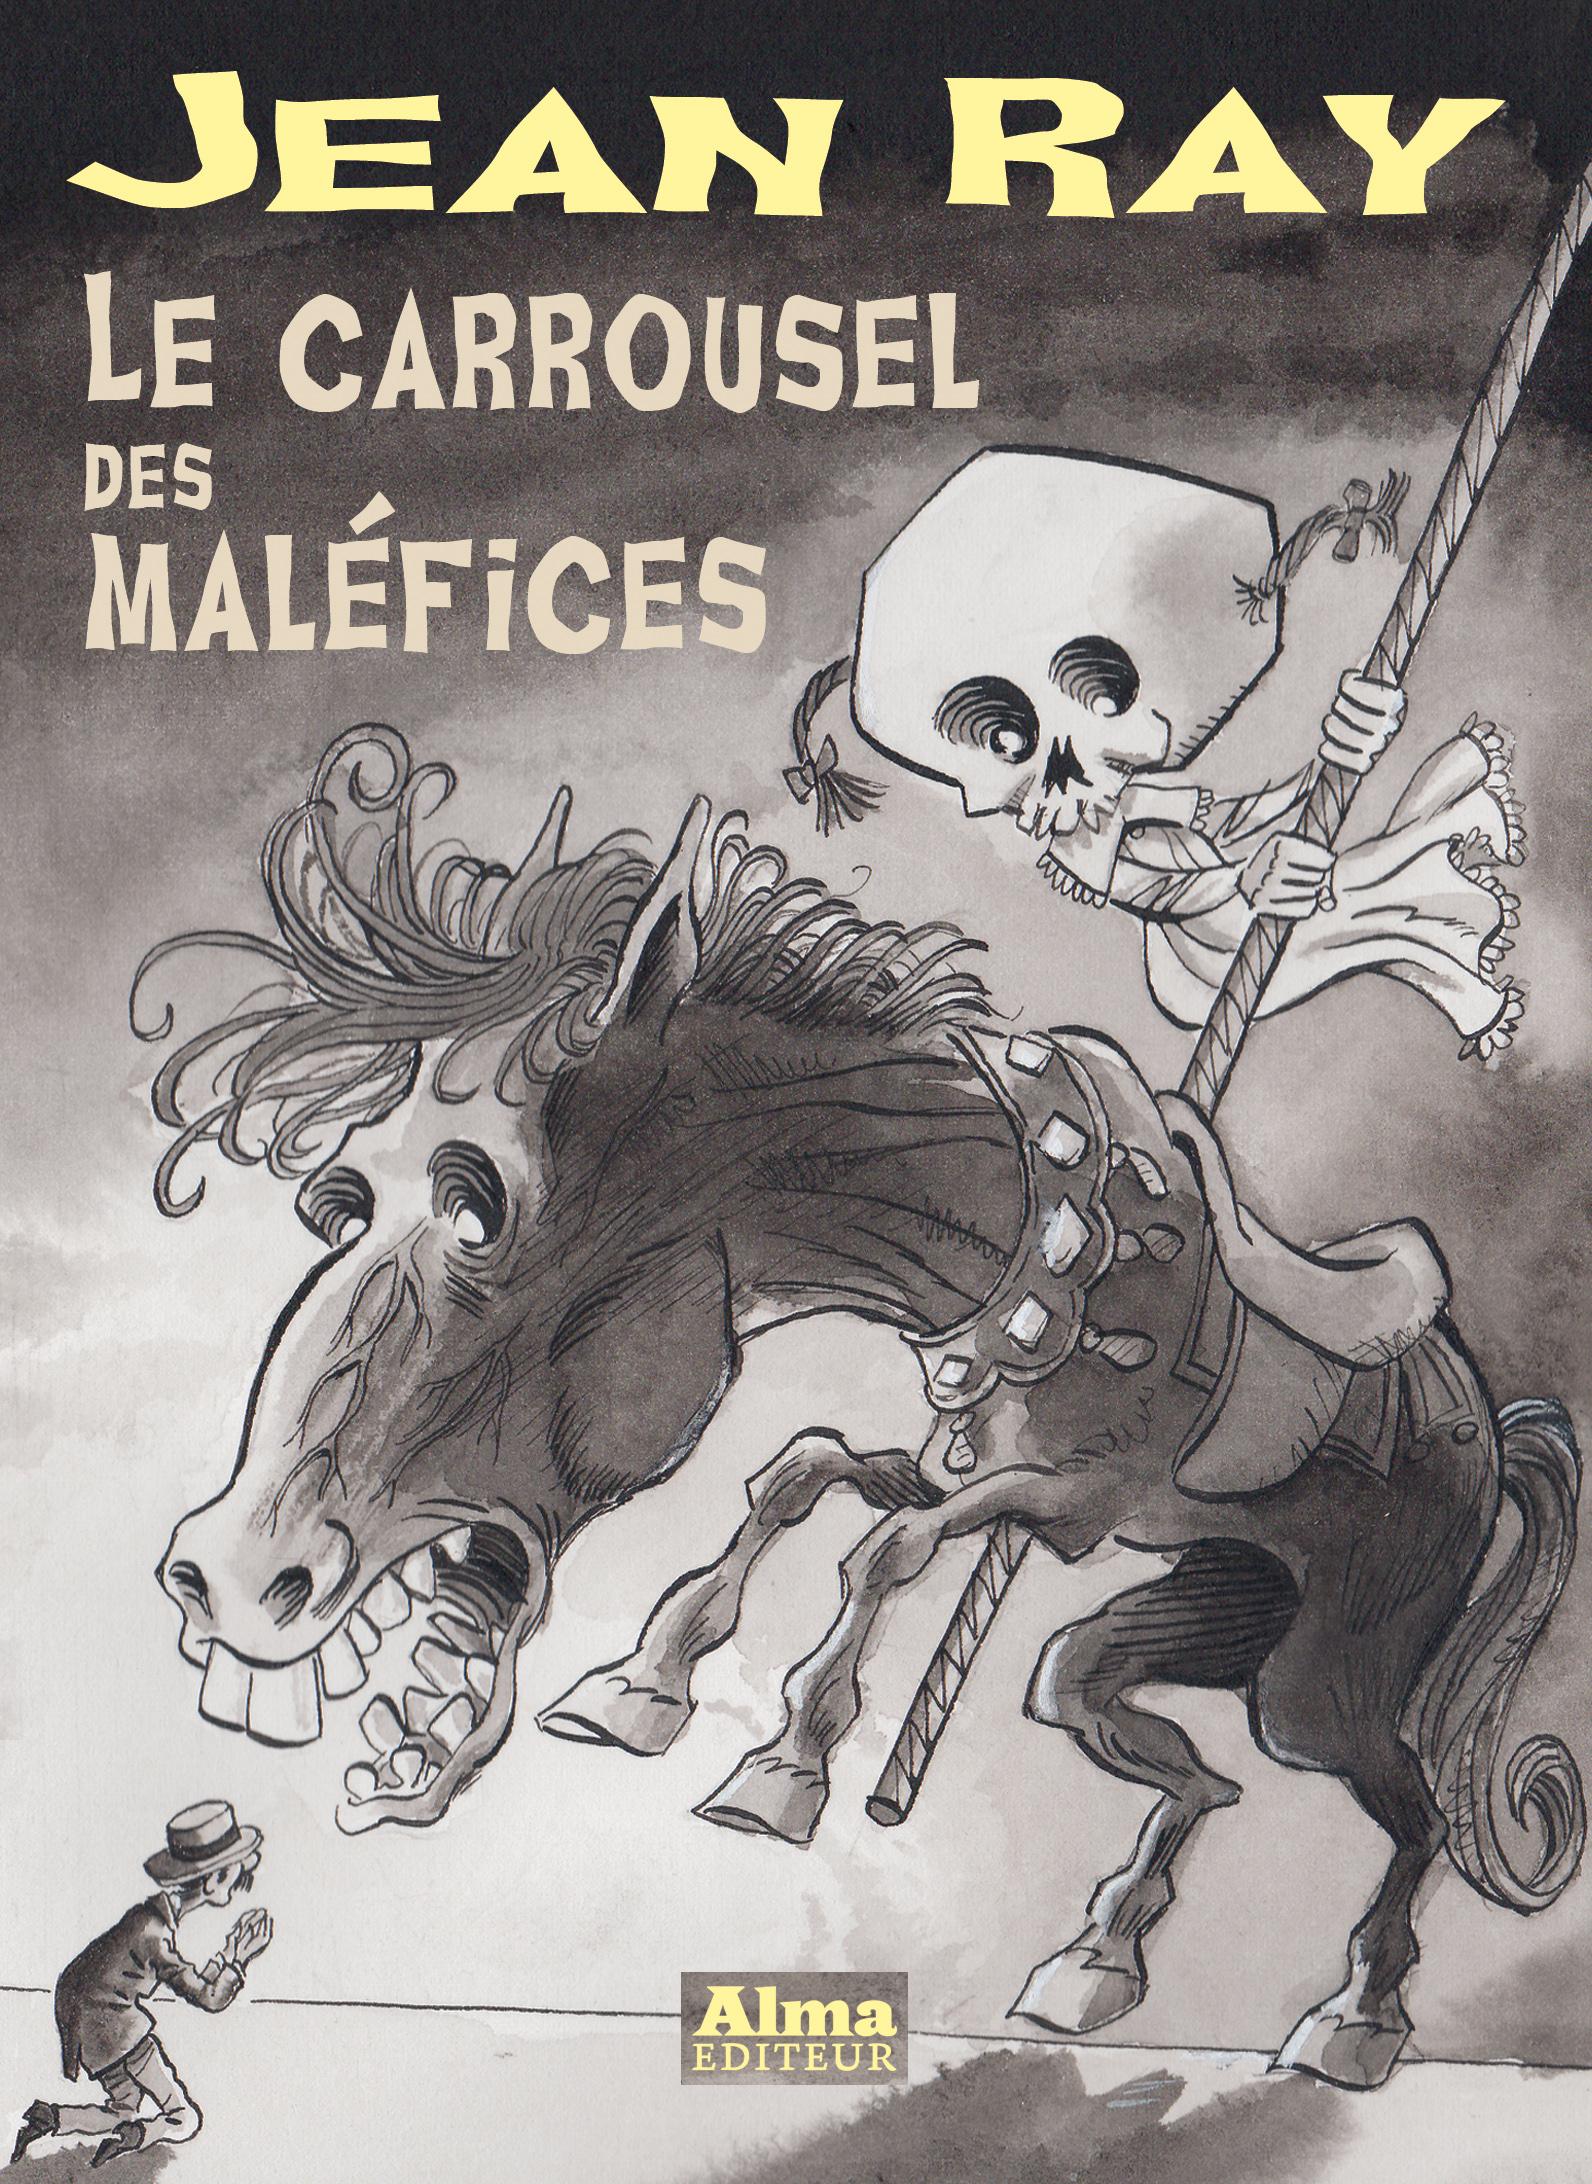 Philippe Foerster Mu Blondeau Le carrousel des maléfices Jean Ray Alma